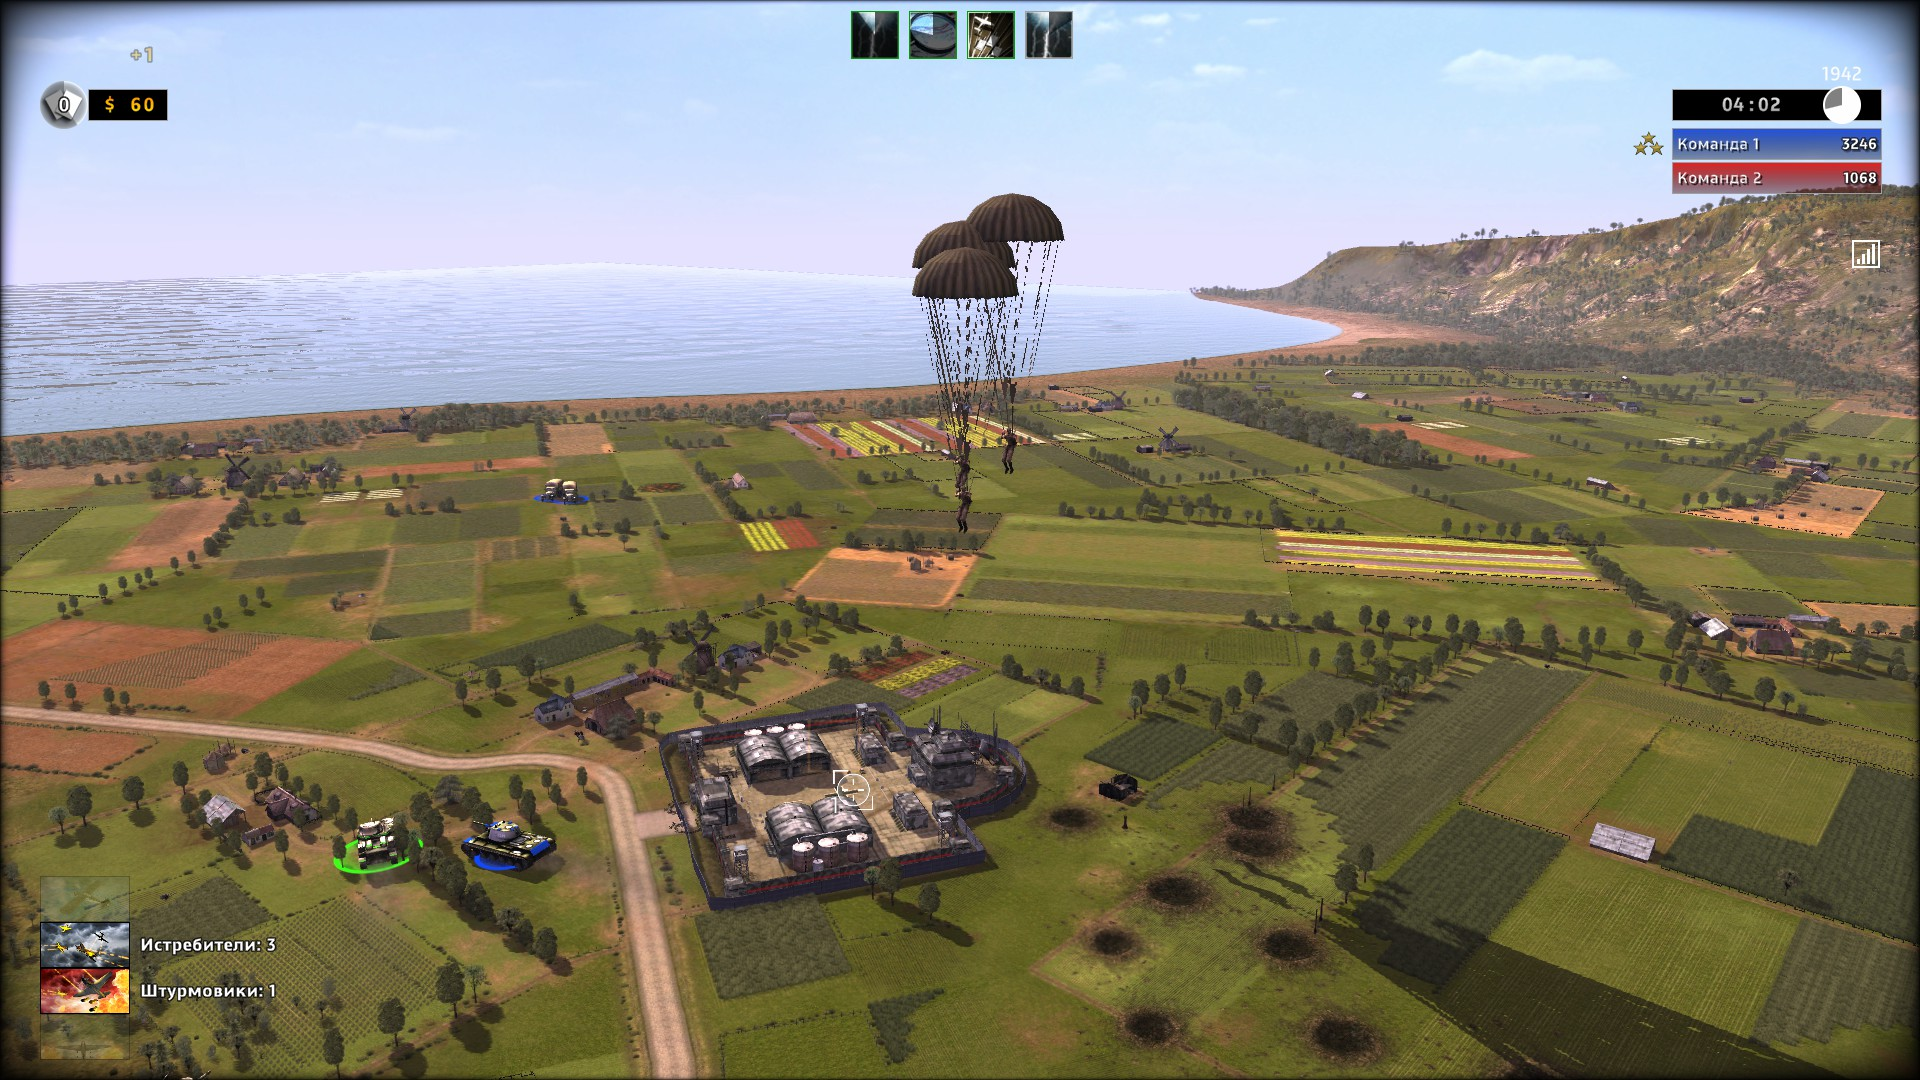 R. U. S. E. Free download full version pc game for windows (xp, 7, 8.